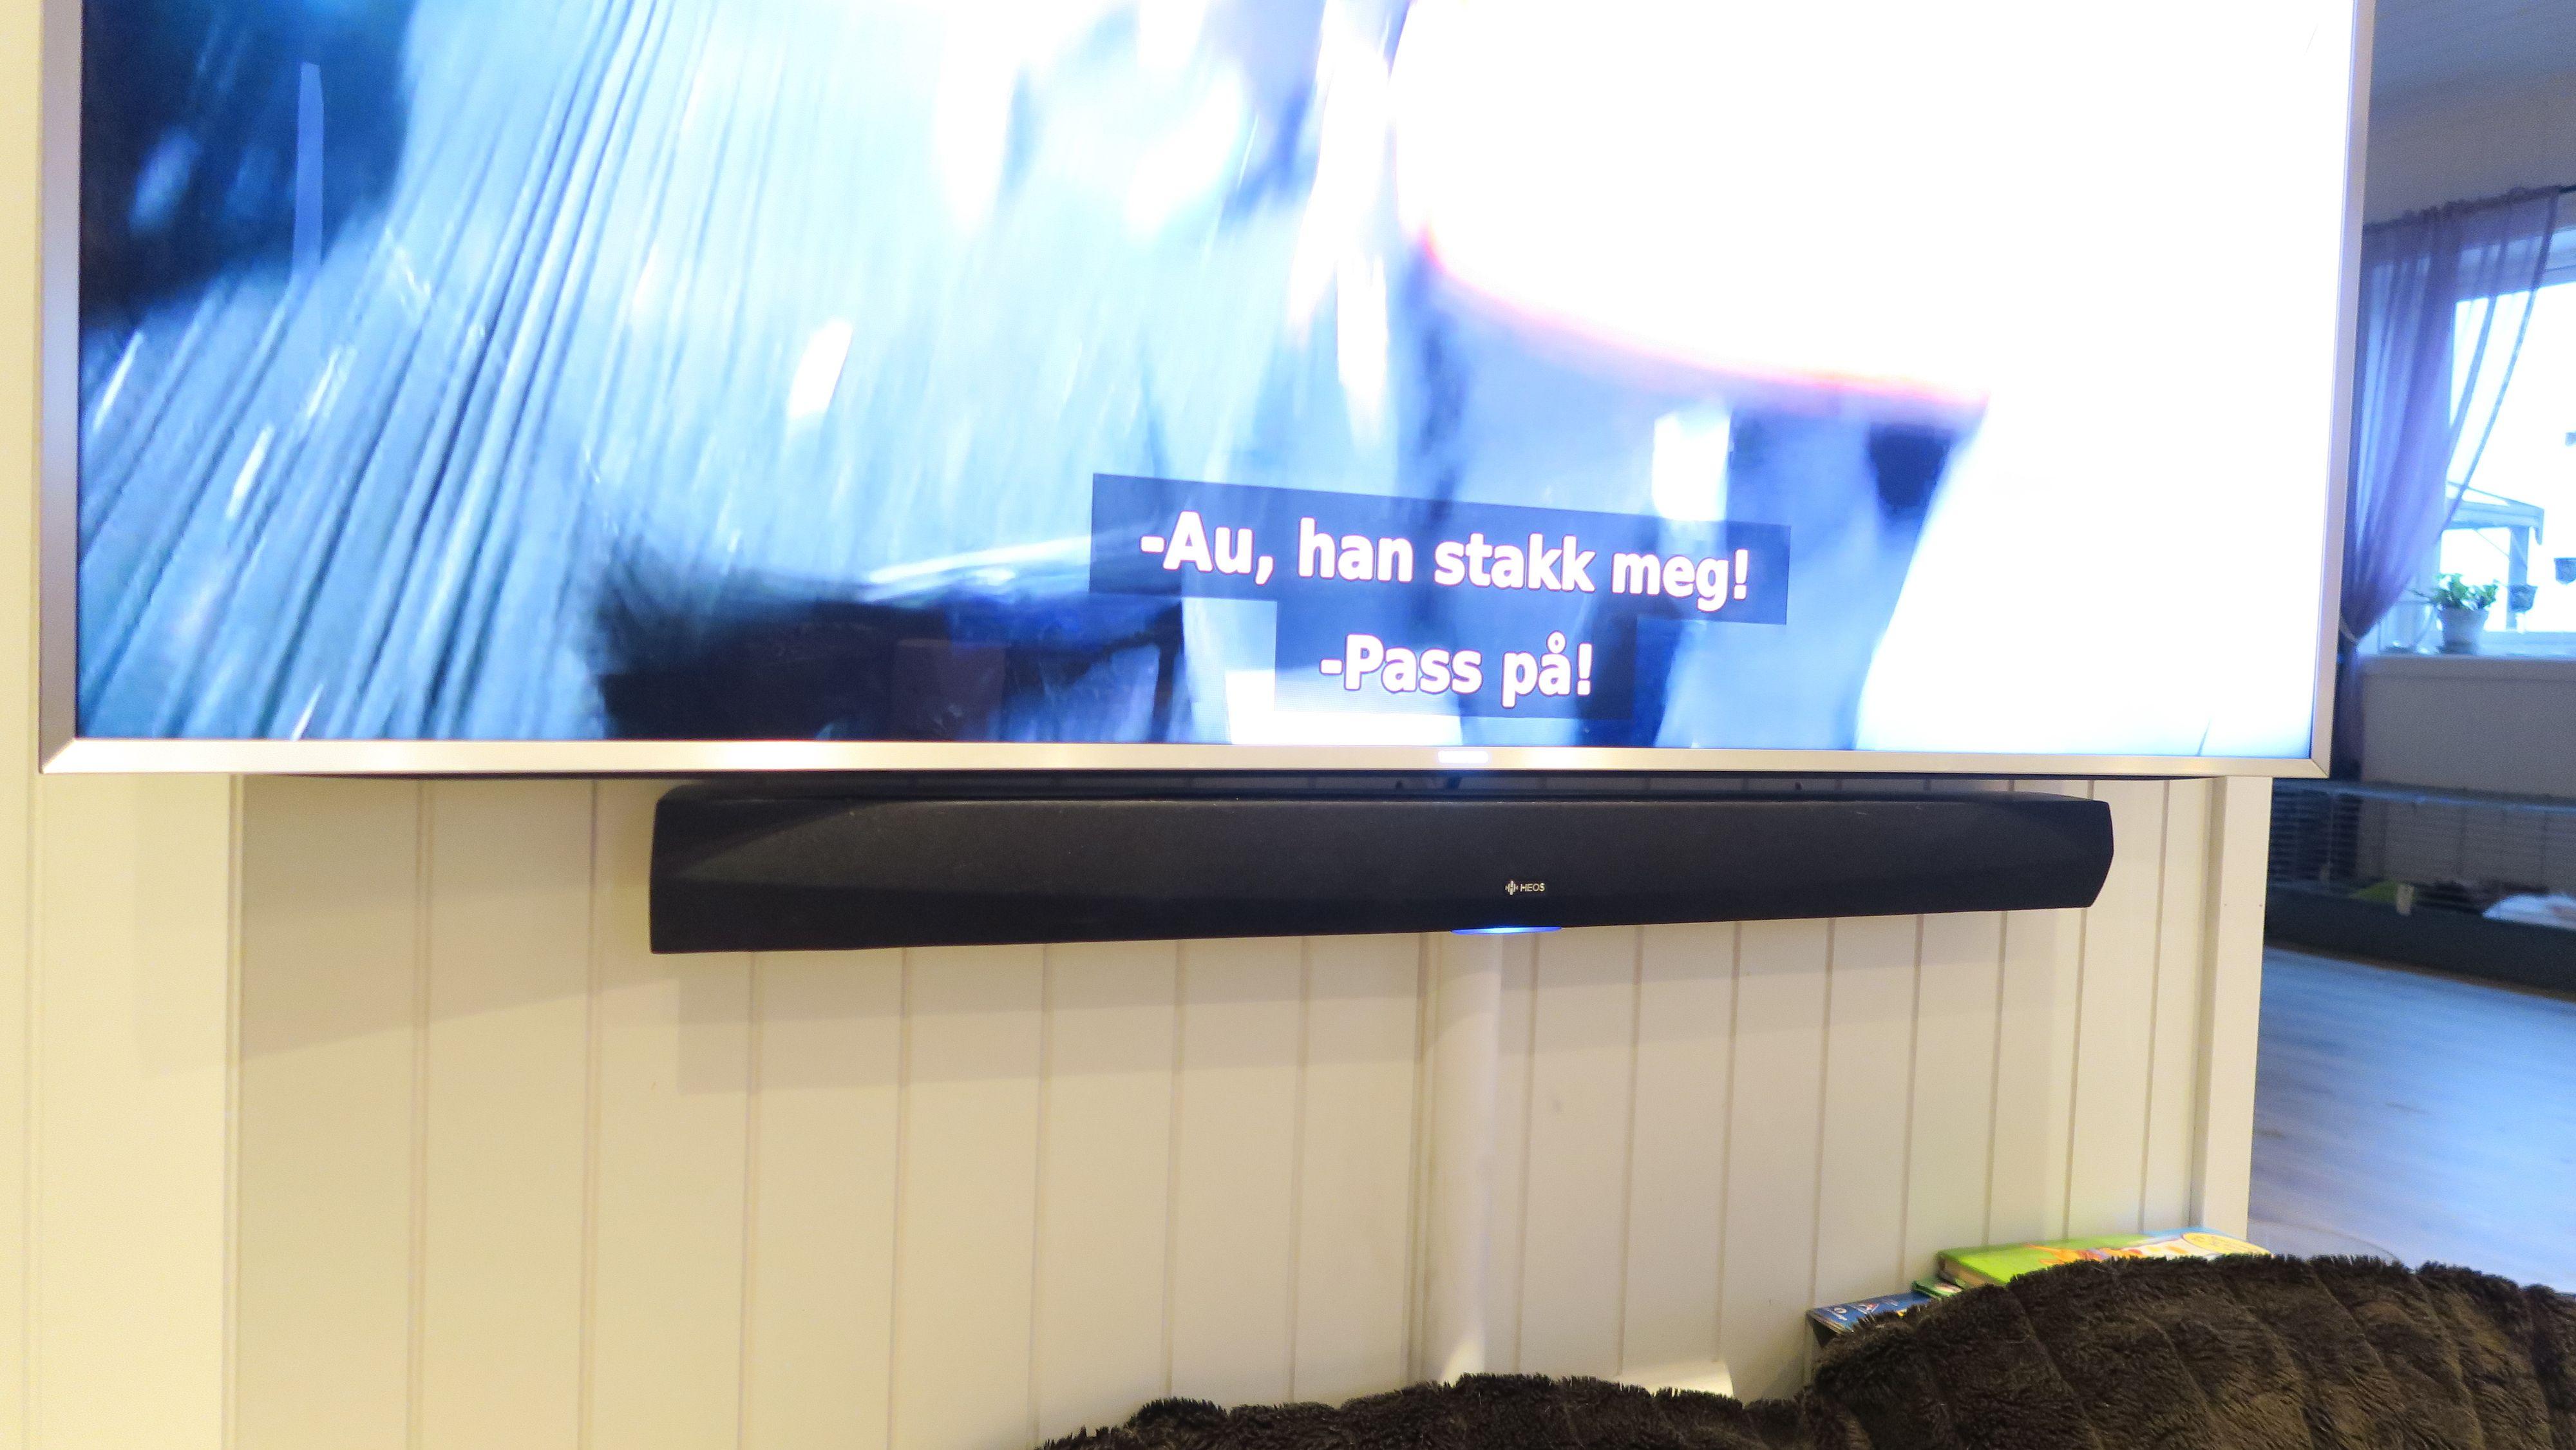 Heos HomeCinema sammen med den 65 tommers TV. Foto: Ole Henrik Johansen / Tek.no